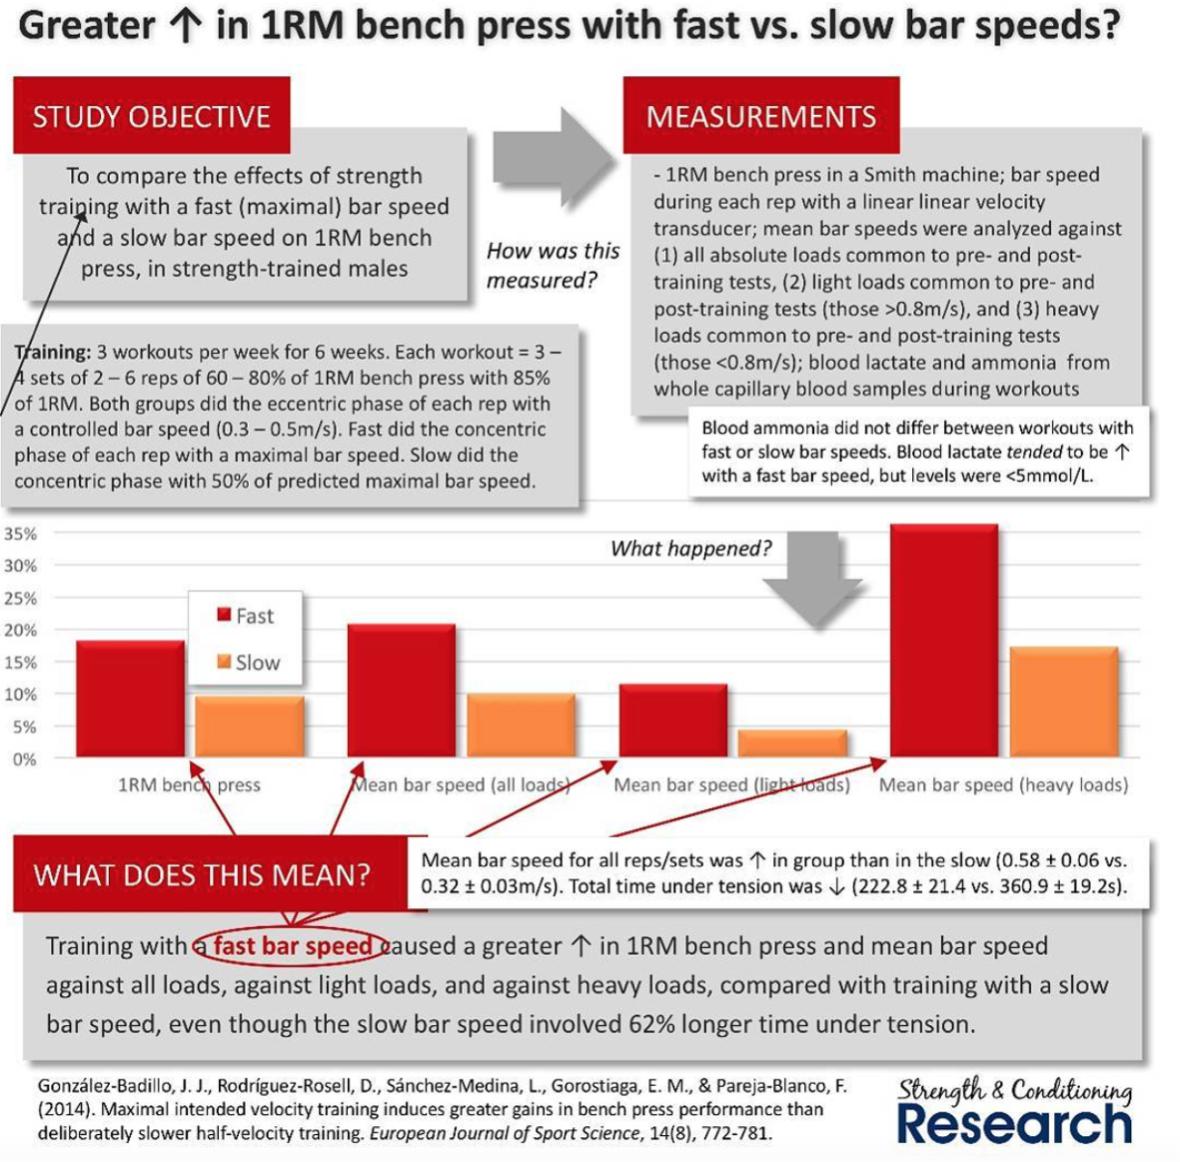 Slow bar speed = NO GAINS